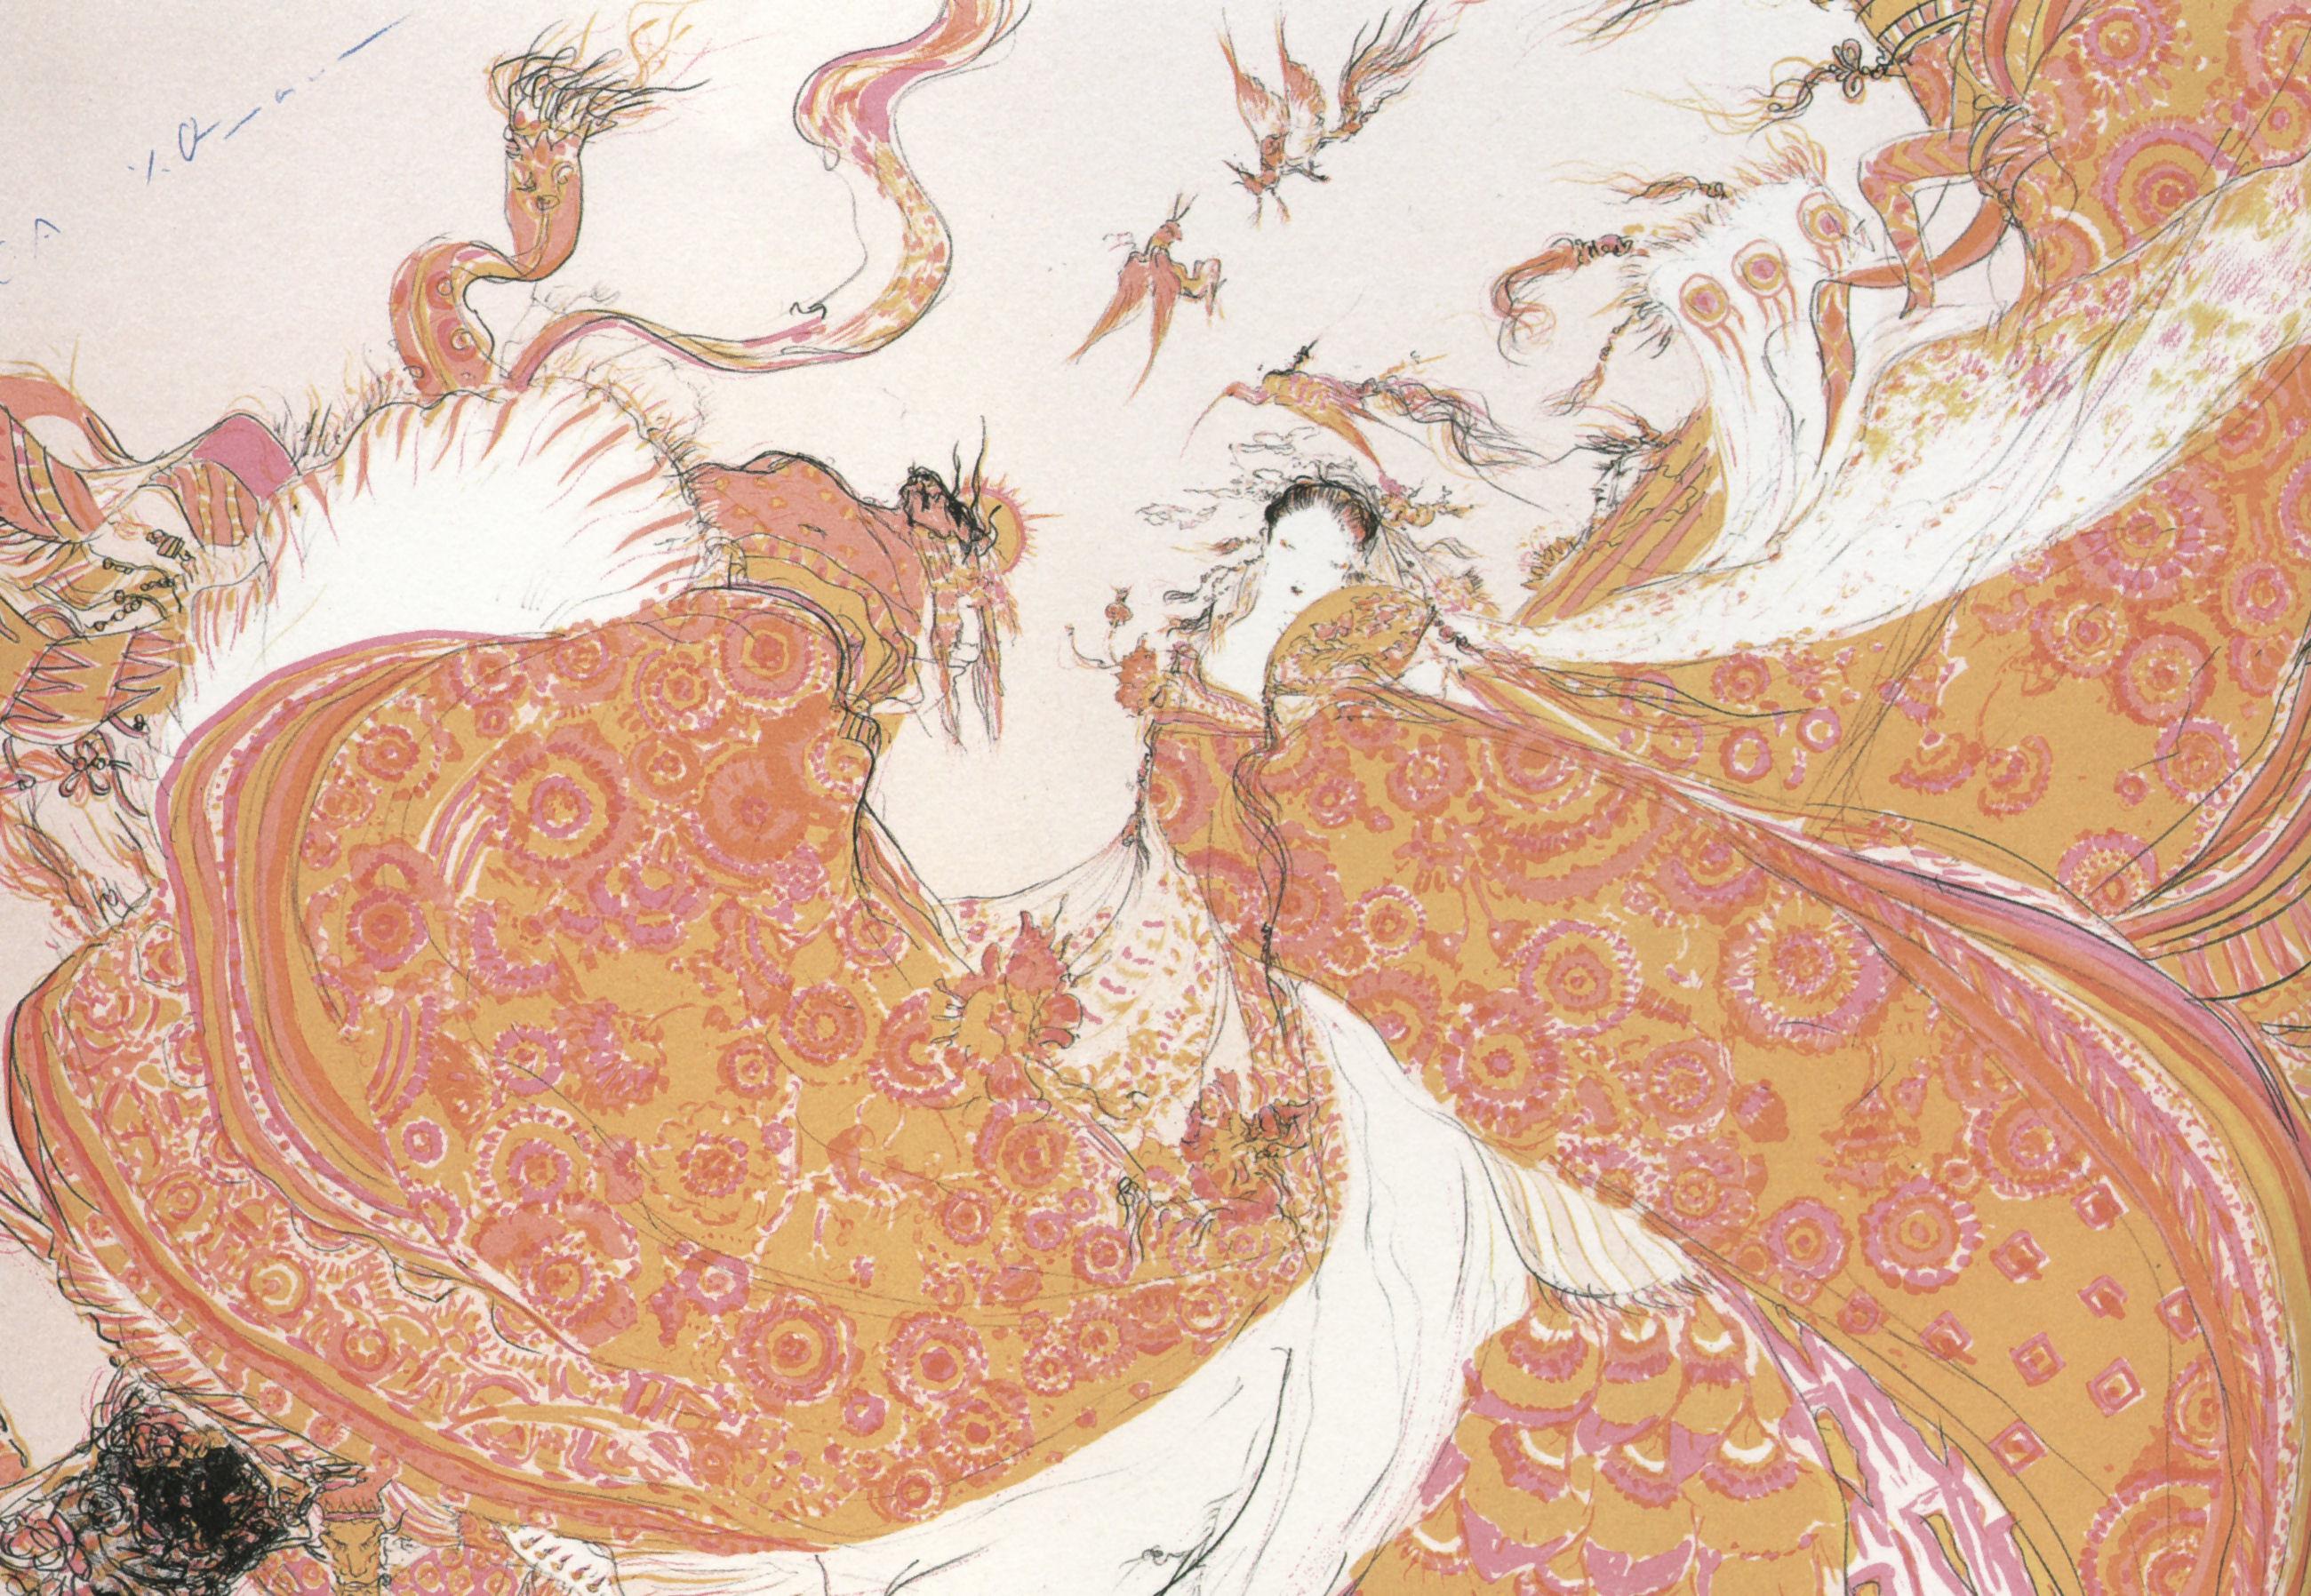 … download Amano: The Complete Prints of Yoshitaka Amano image